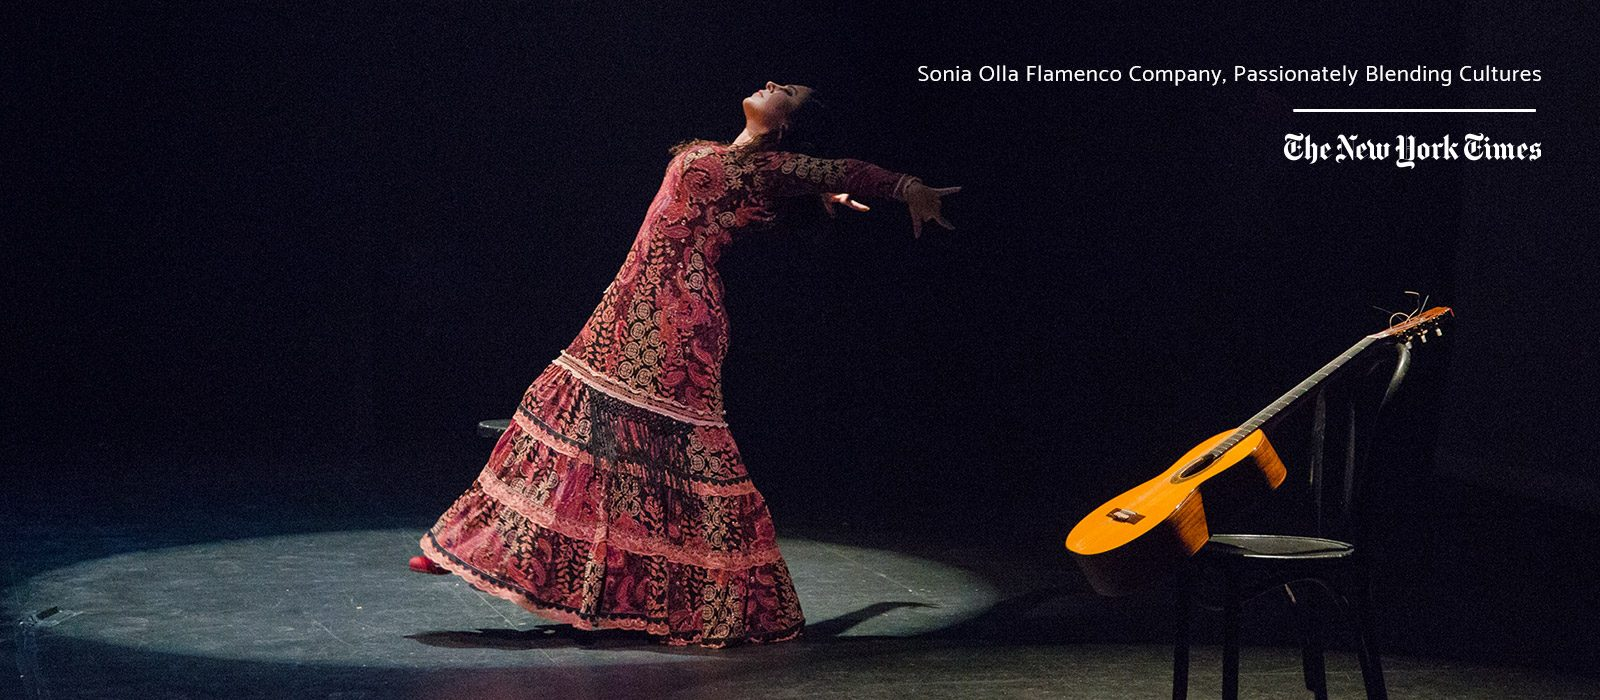 Sonia Olla Flamenco Company - The New York Times